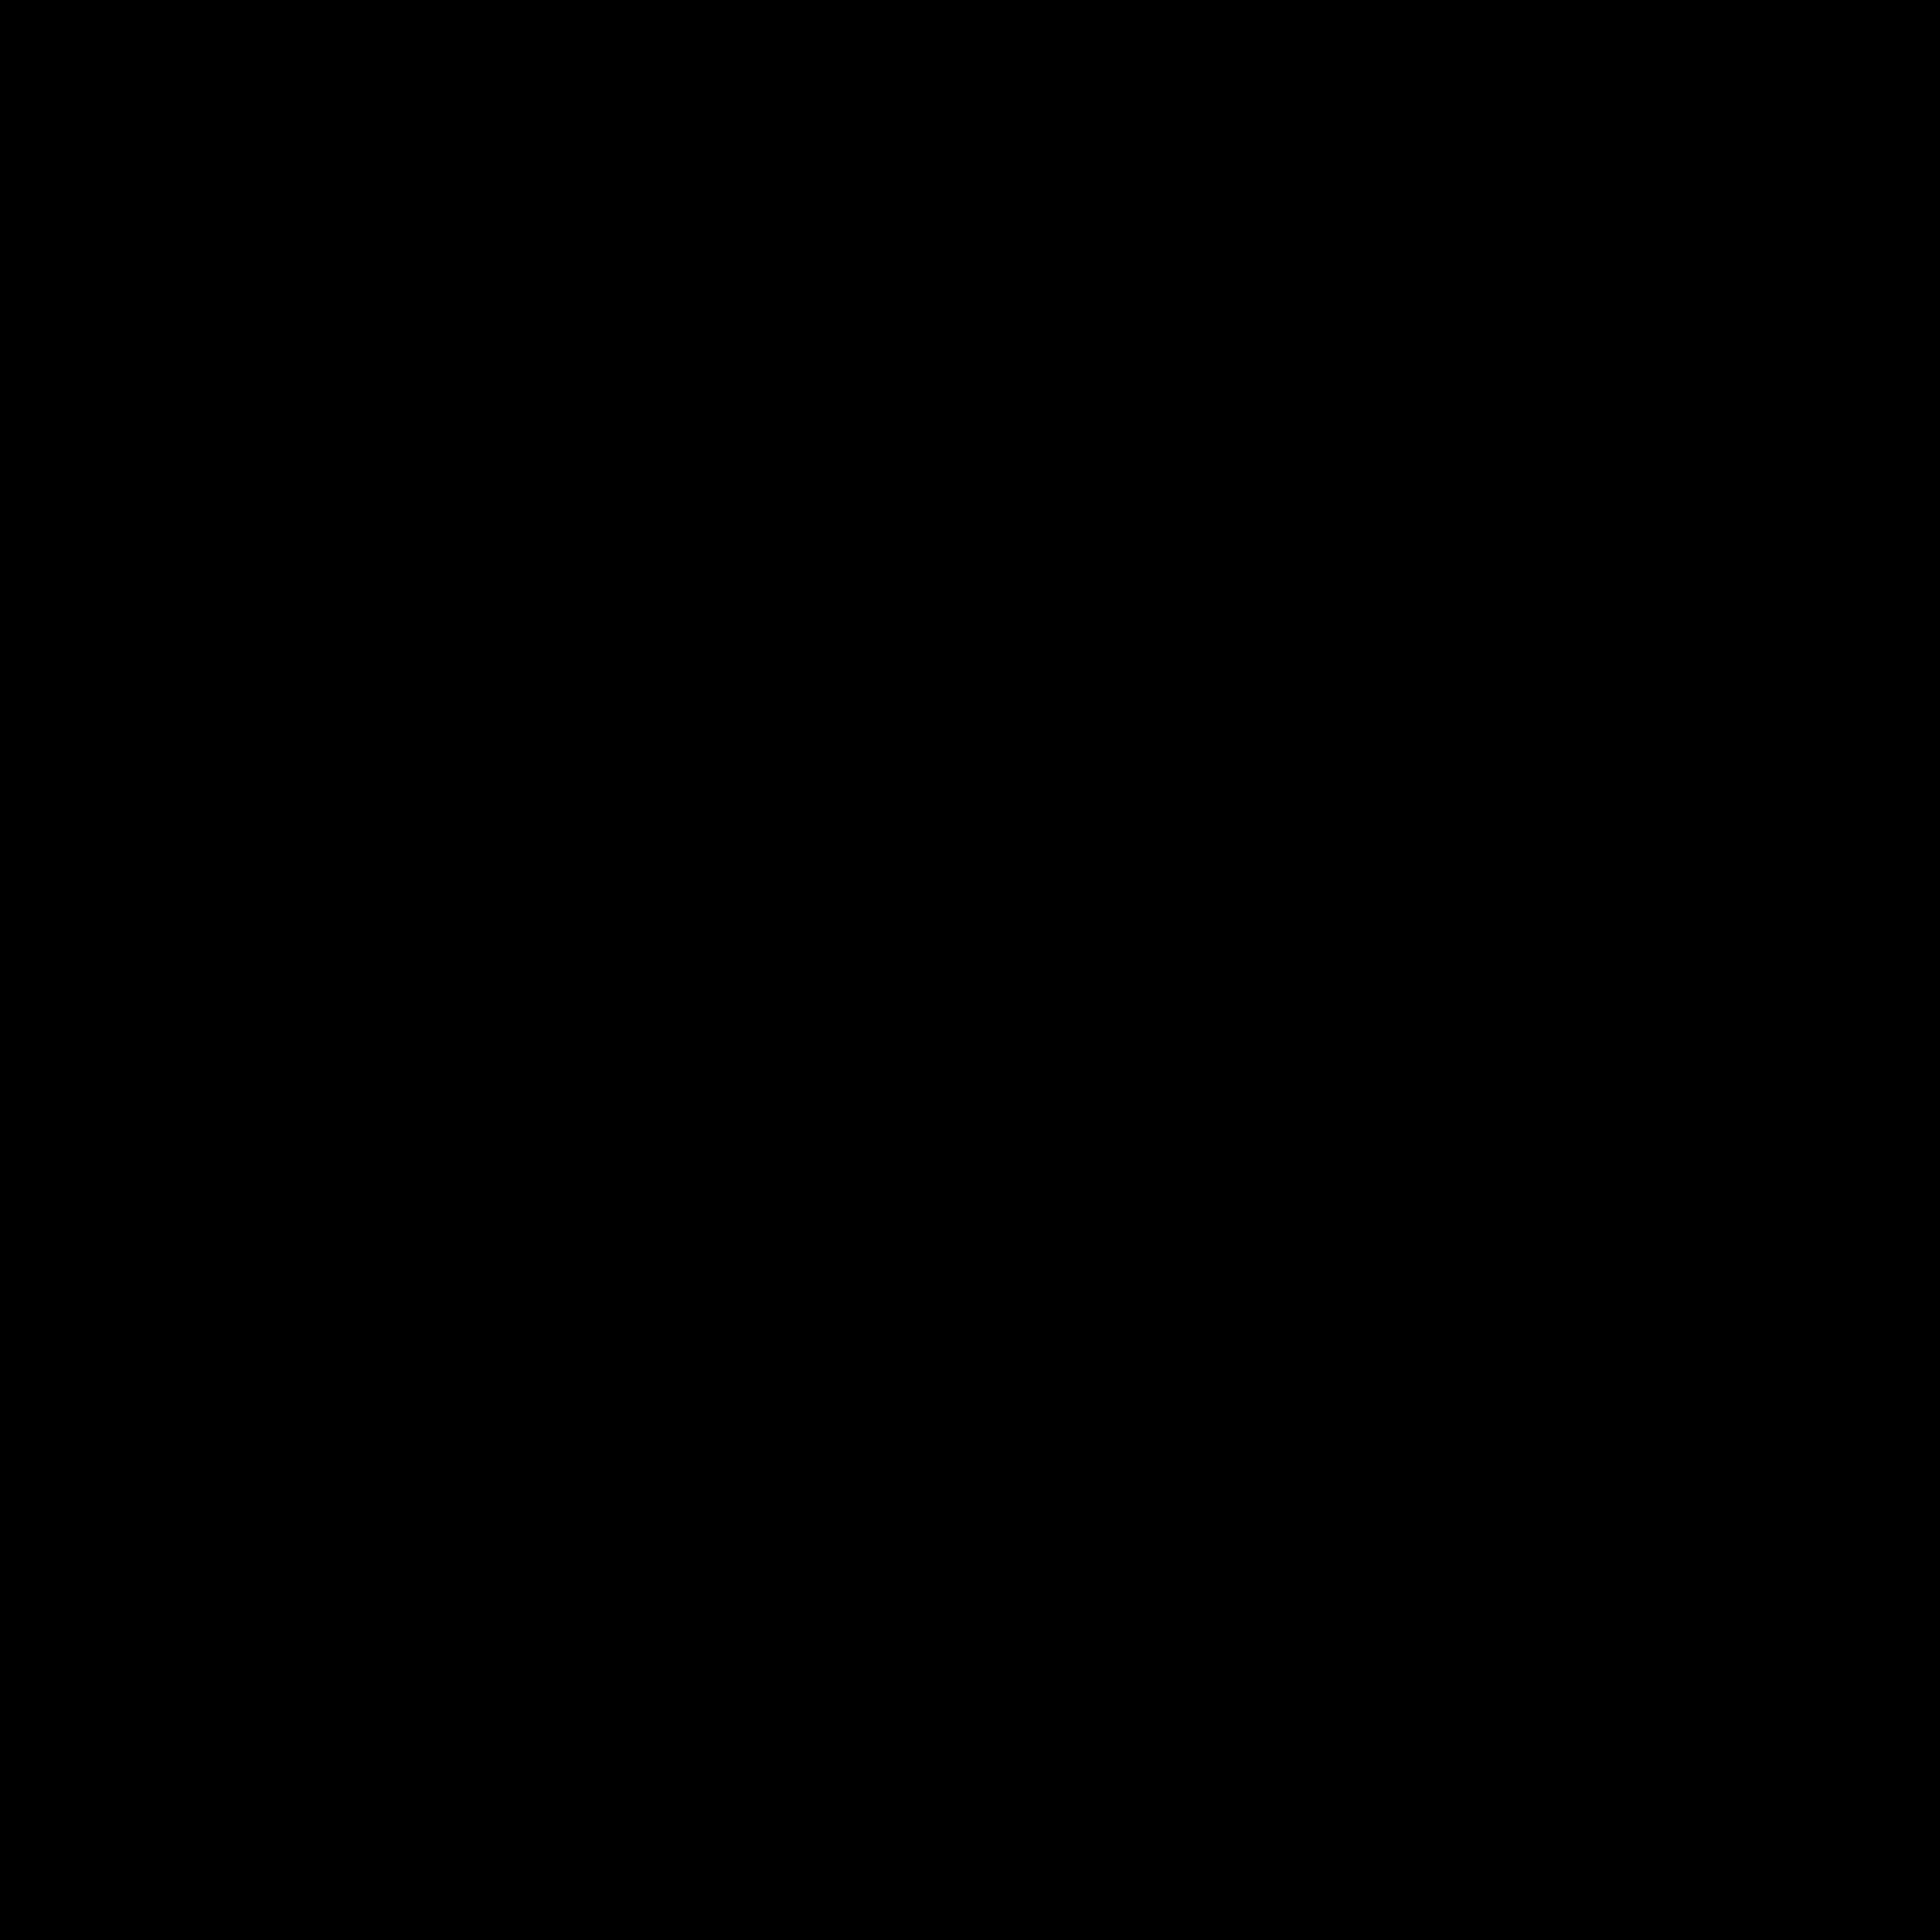 Thermische bonprinter Citizen Ct-S651 outline